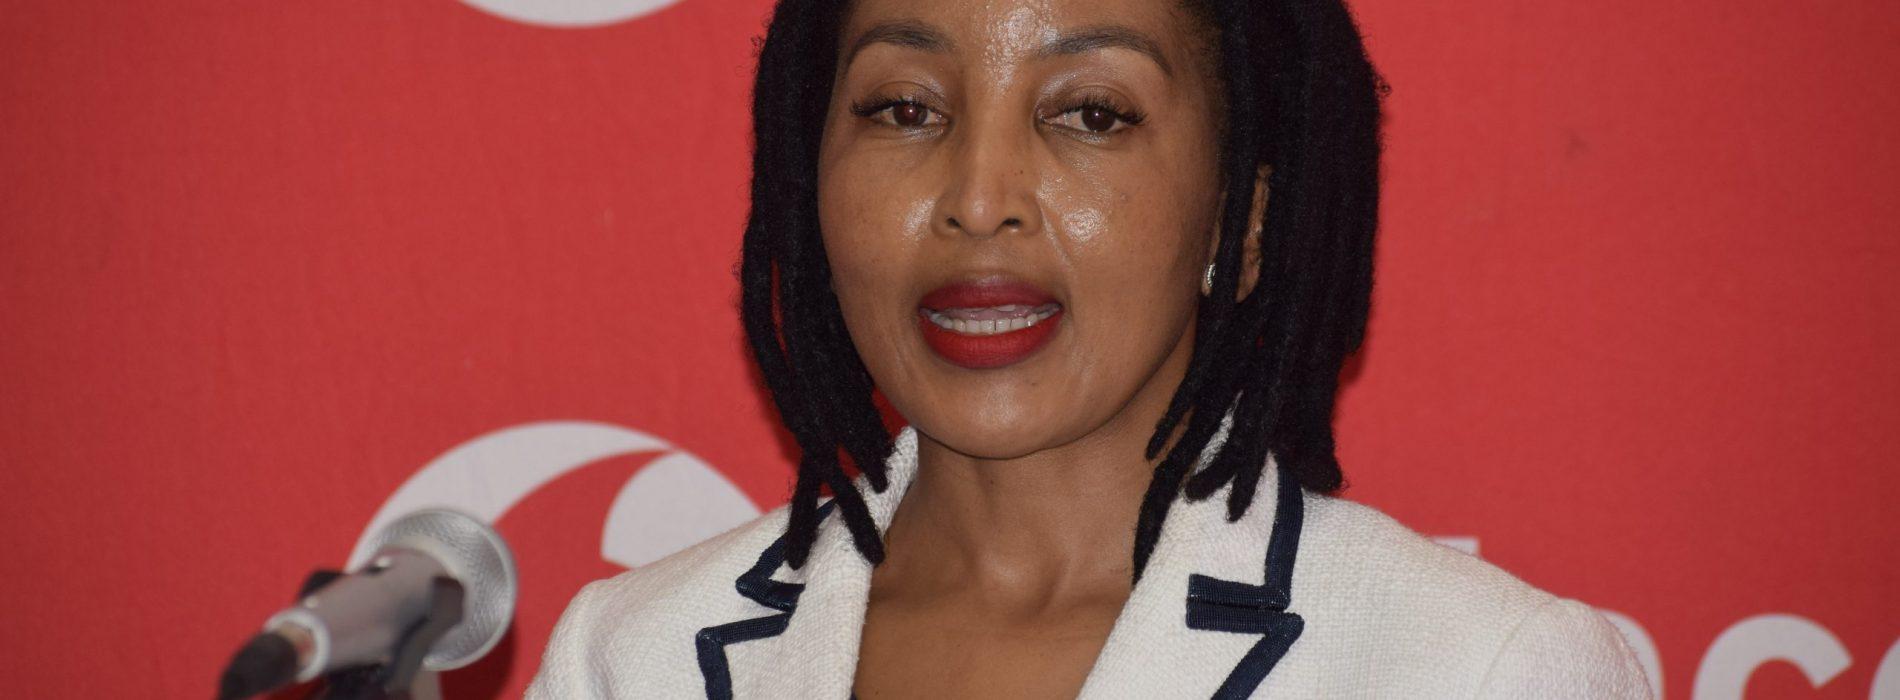 Vodacom sets up financial services  company